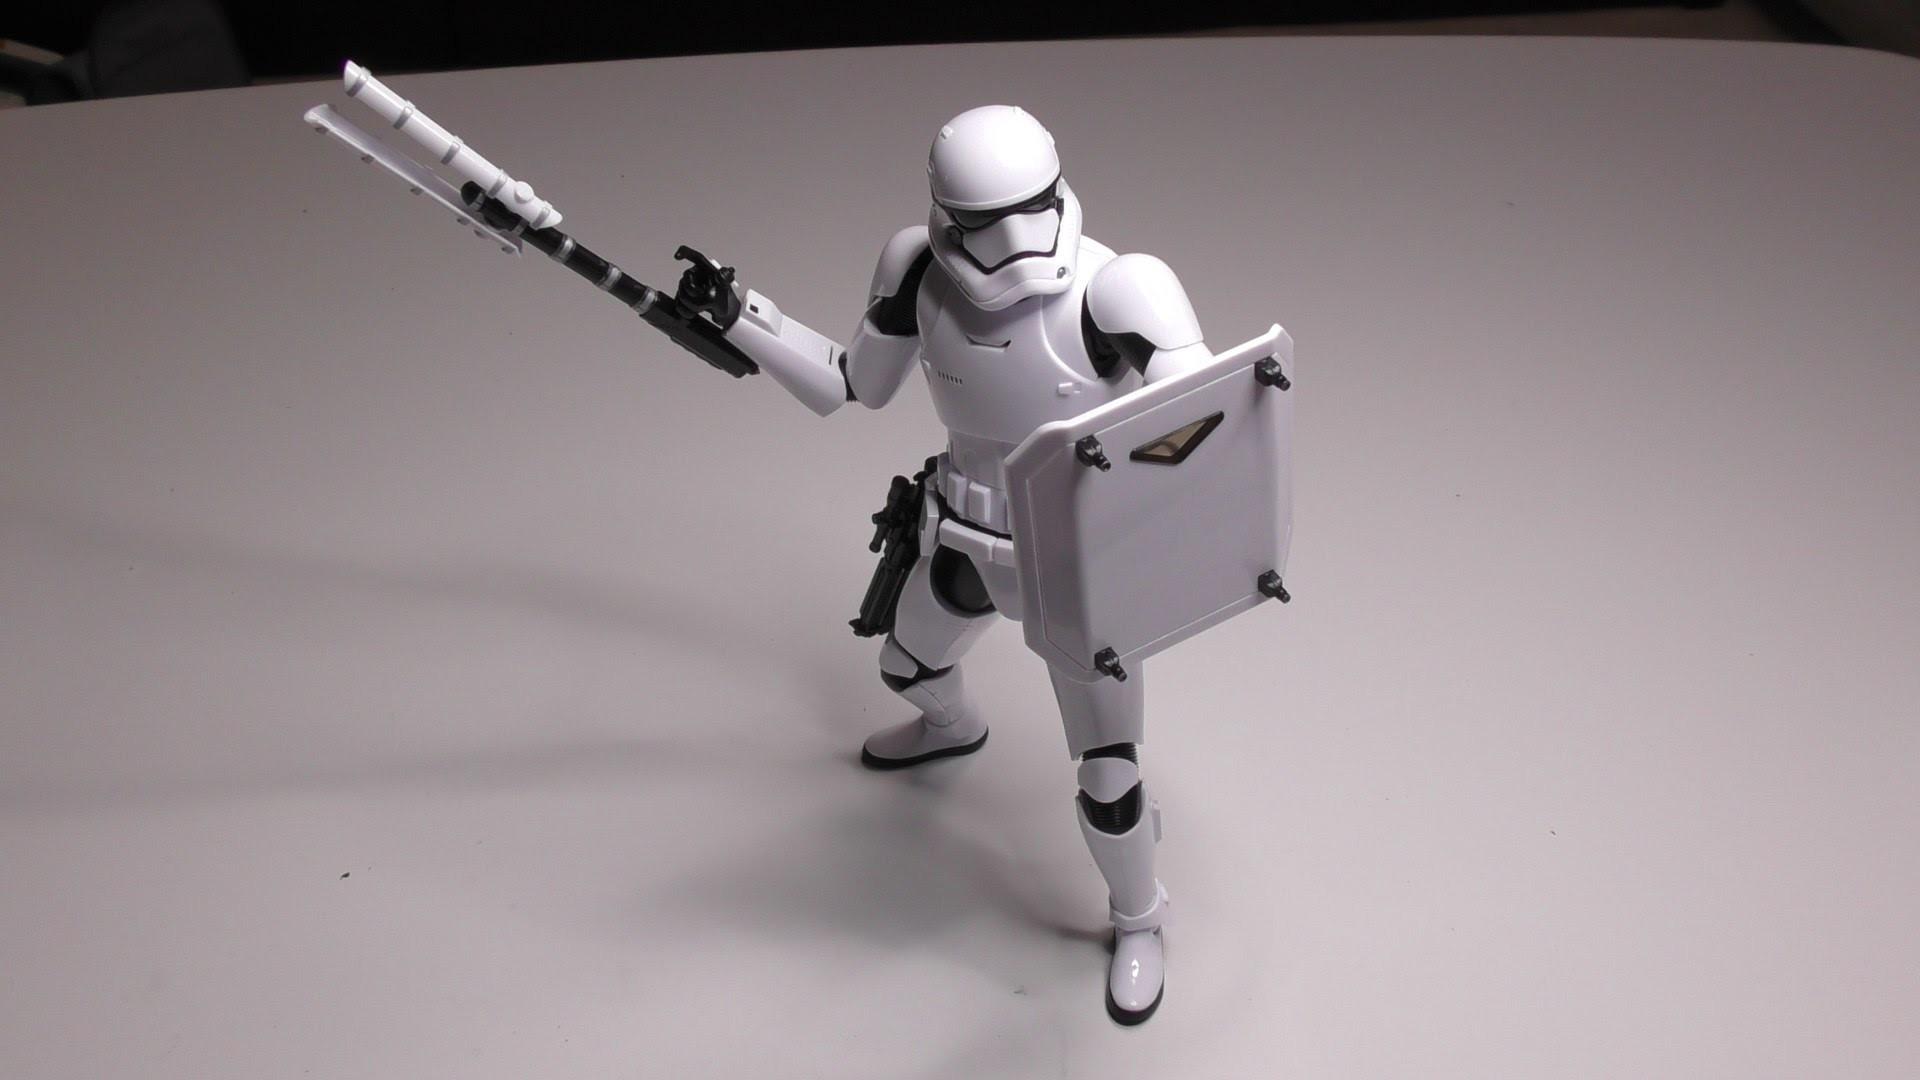 STAR WARS EP7 – First Order Storm Trooper Plamodel build video